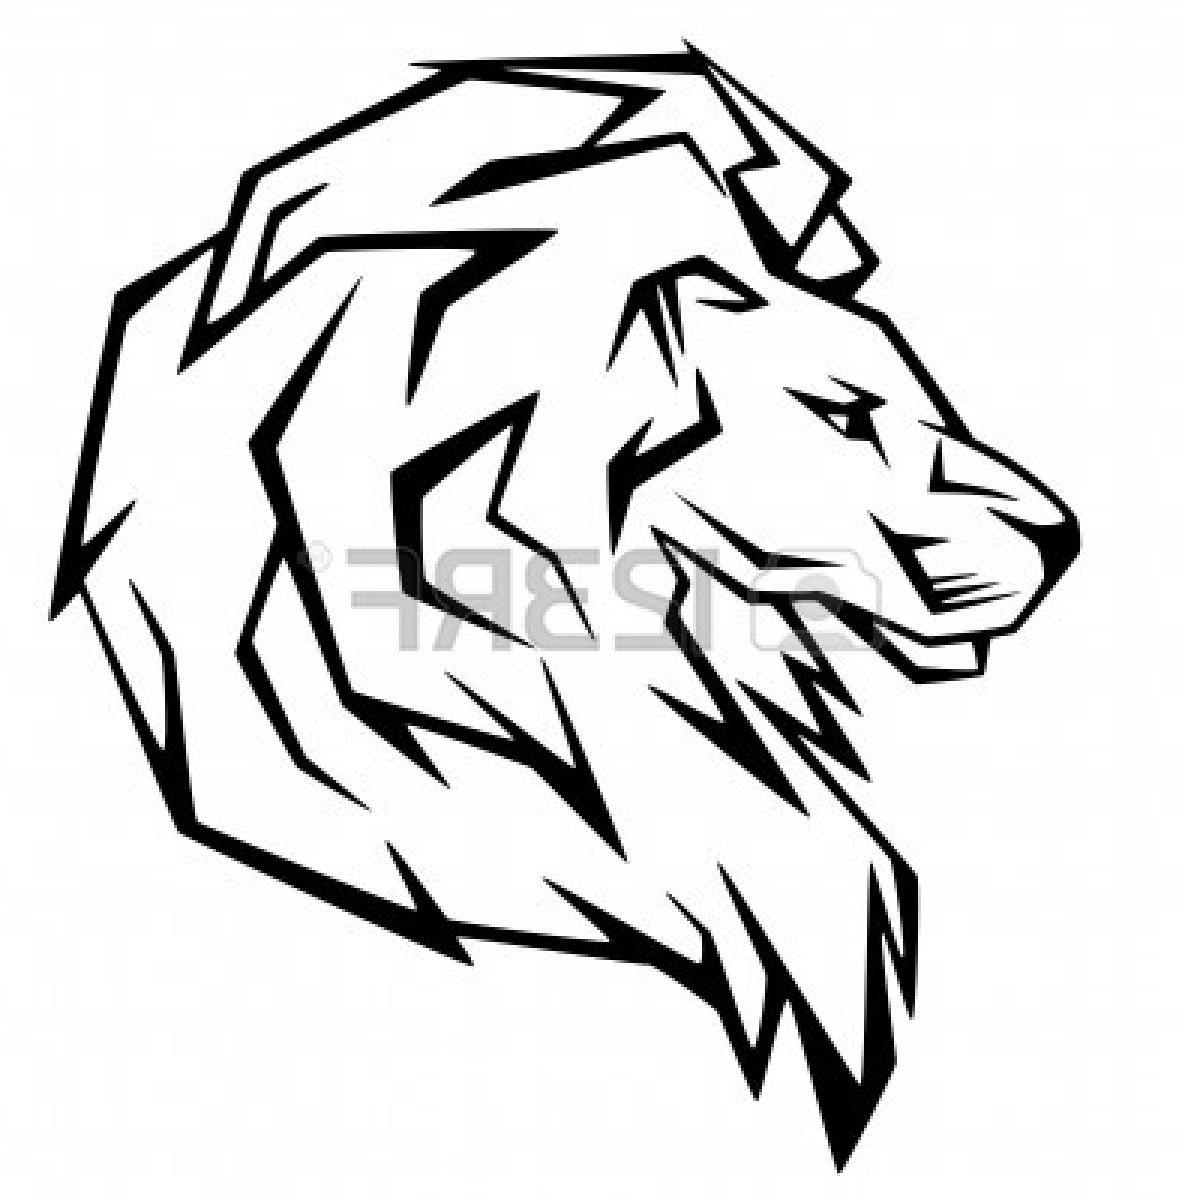 1185x1200 Hd Lion Head Silhouette Clip Art Vector Illustration Library